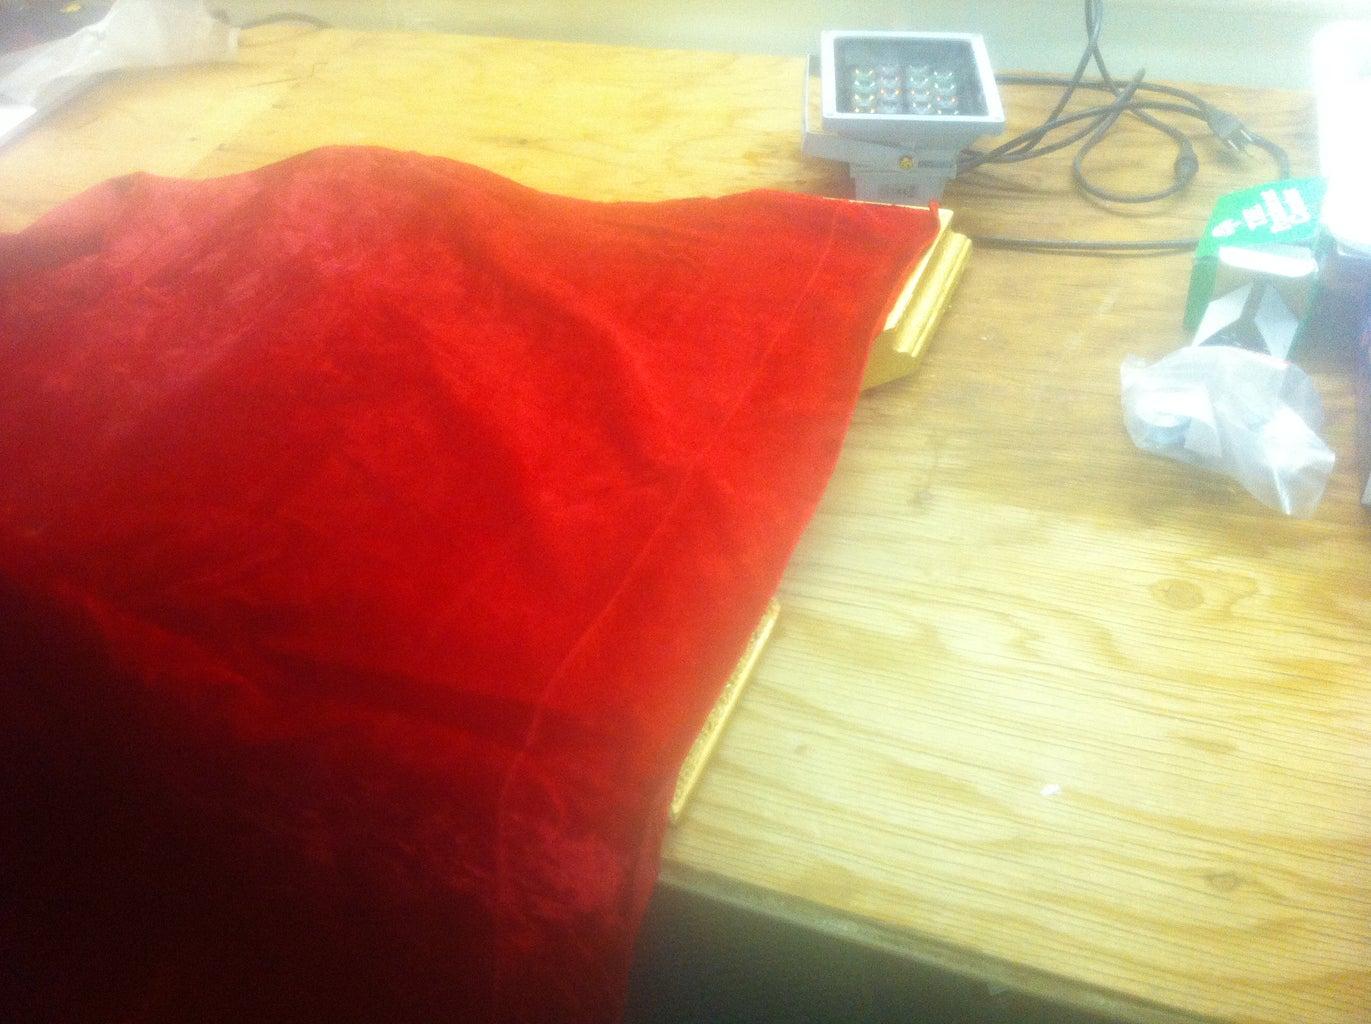 Mount Fabric